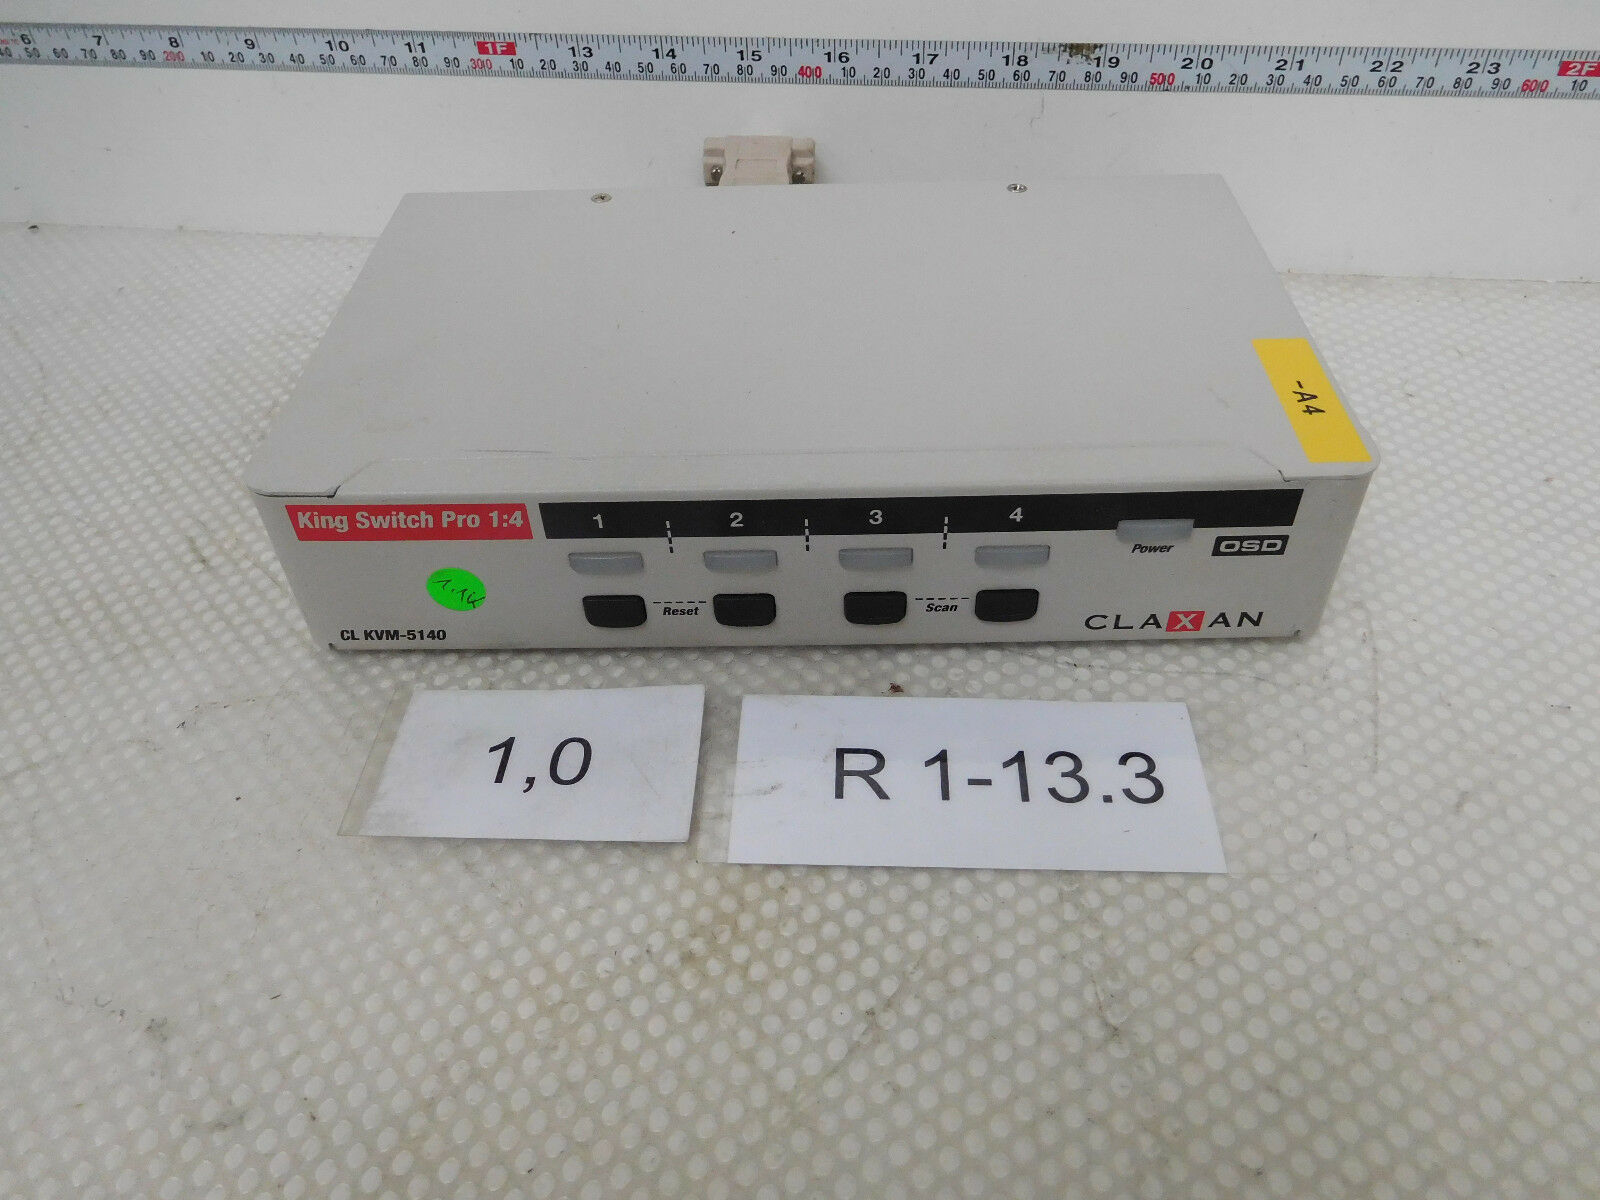 Claxan King Switch pro 1 4, Cl Kvm-5140